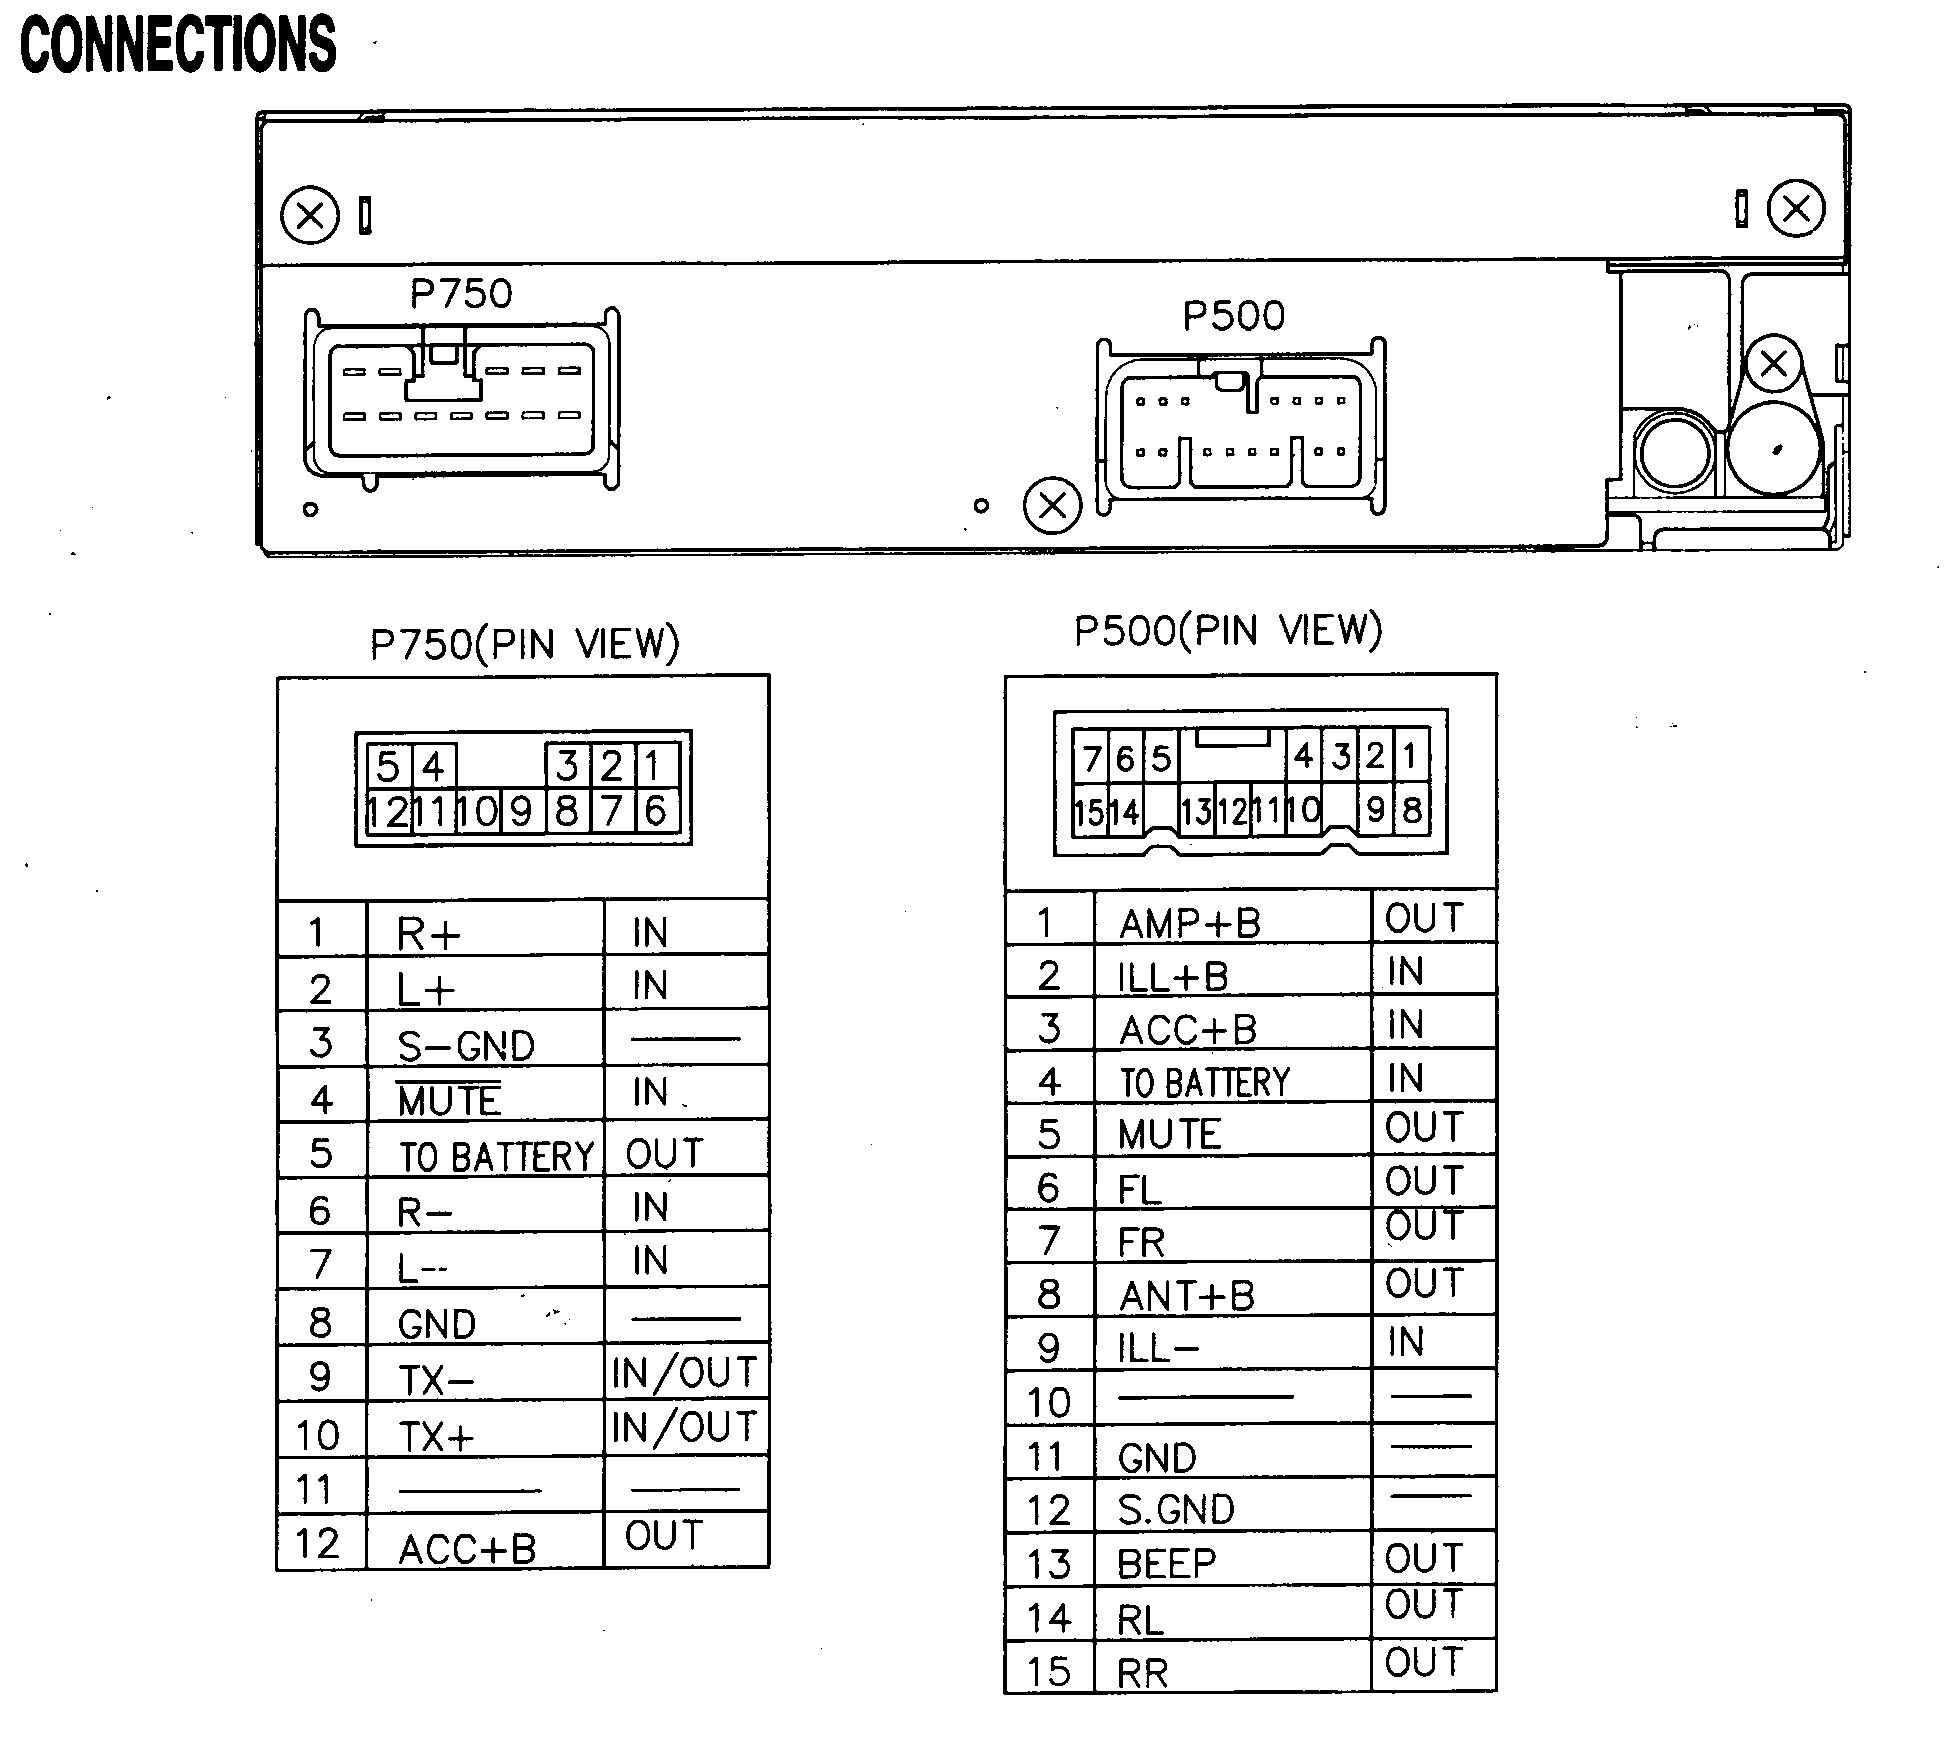 2002 Toyota Sequoia 6cd Jbl Stereo Wiring Diagram